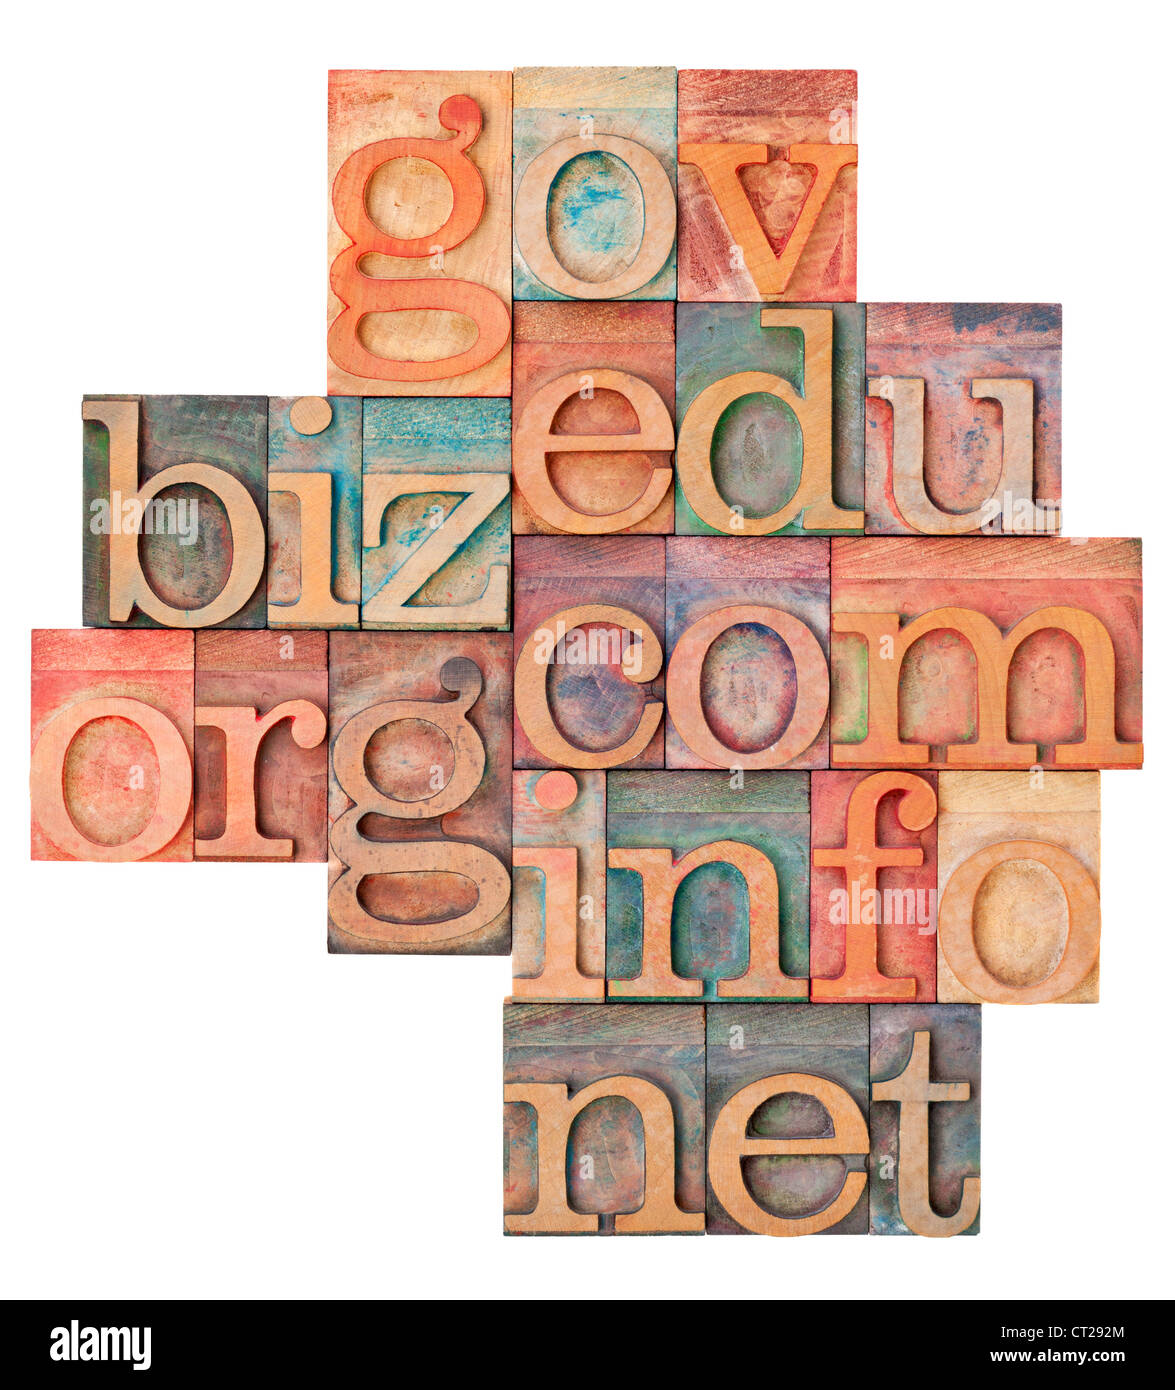 collage of popular internet domain extensions (org, biz, gov, net, info, edu, com) - vintage letterpress wood type - Stock Image